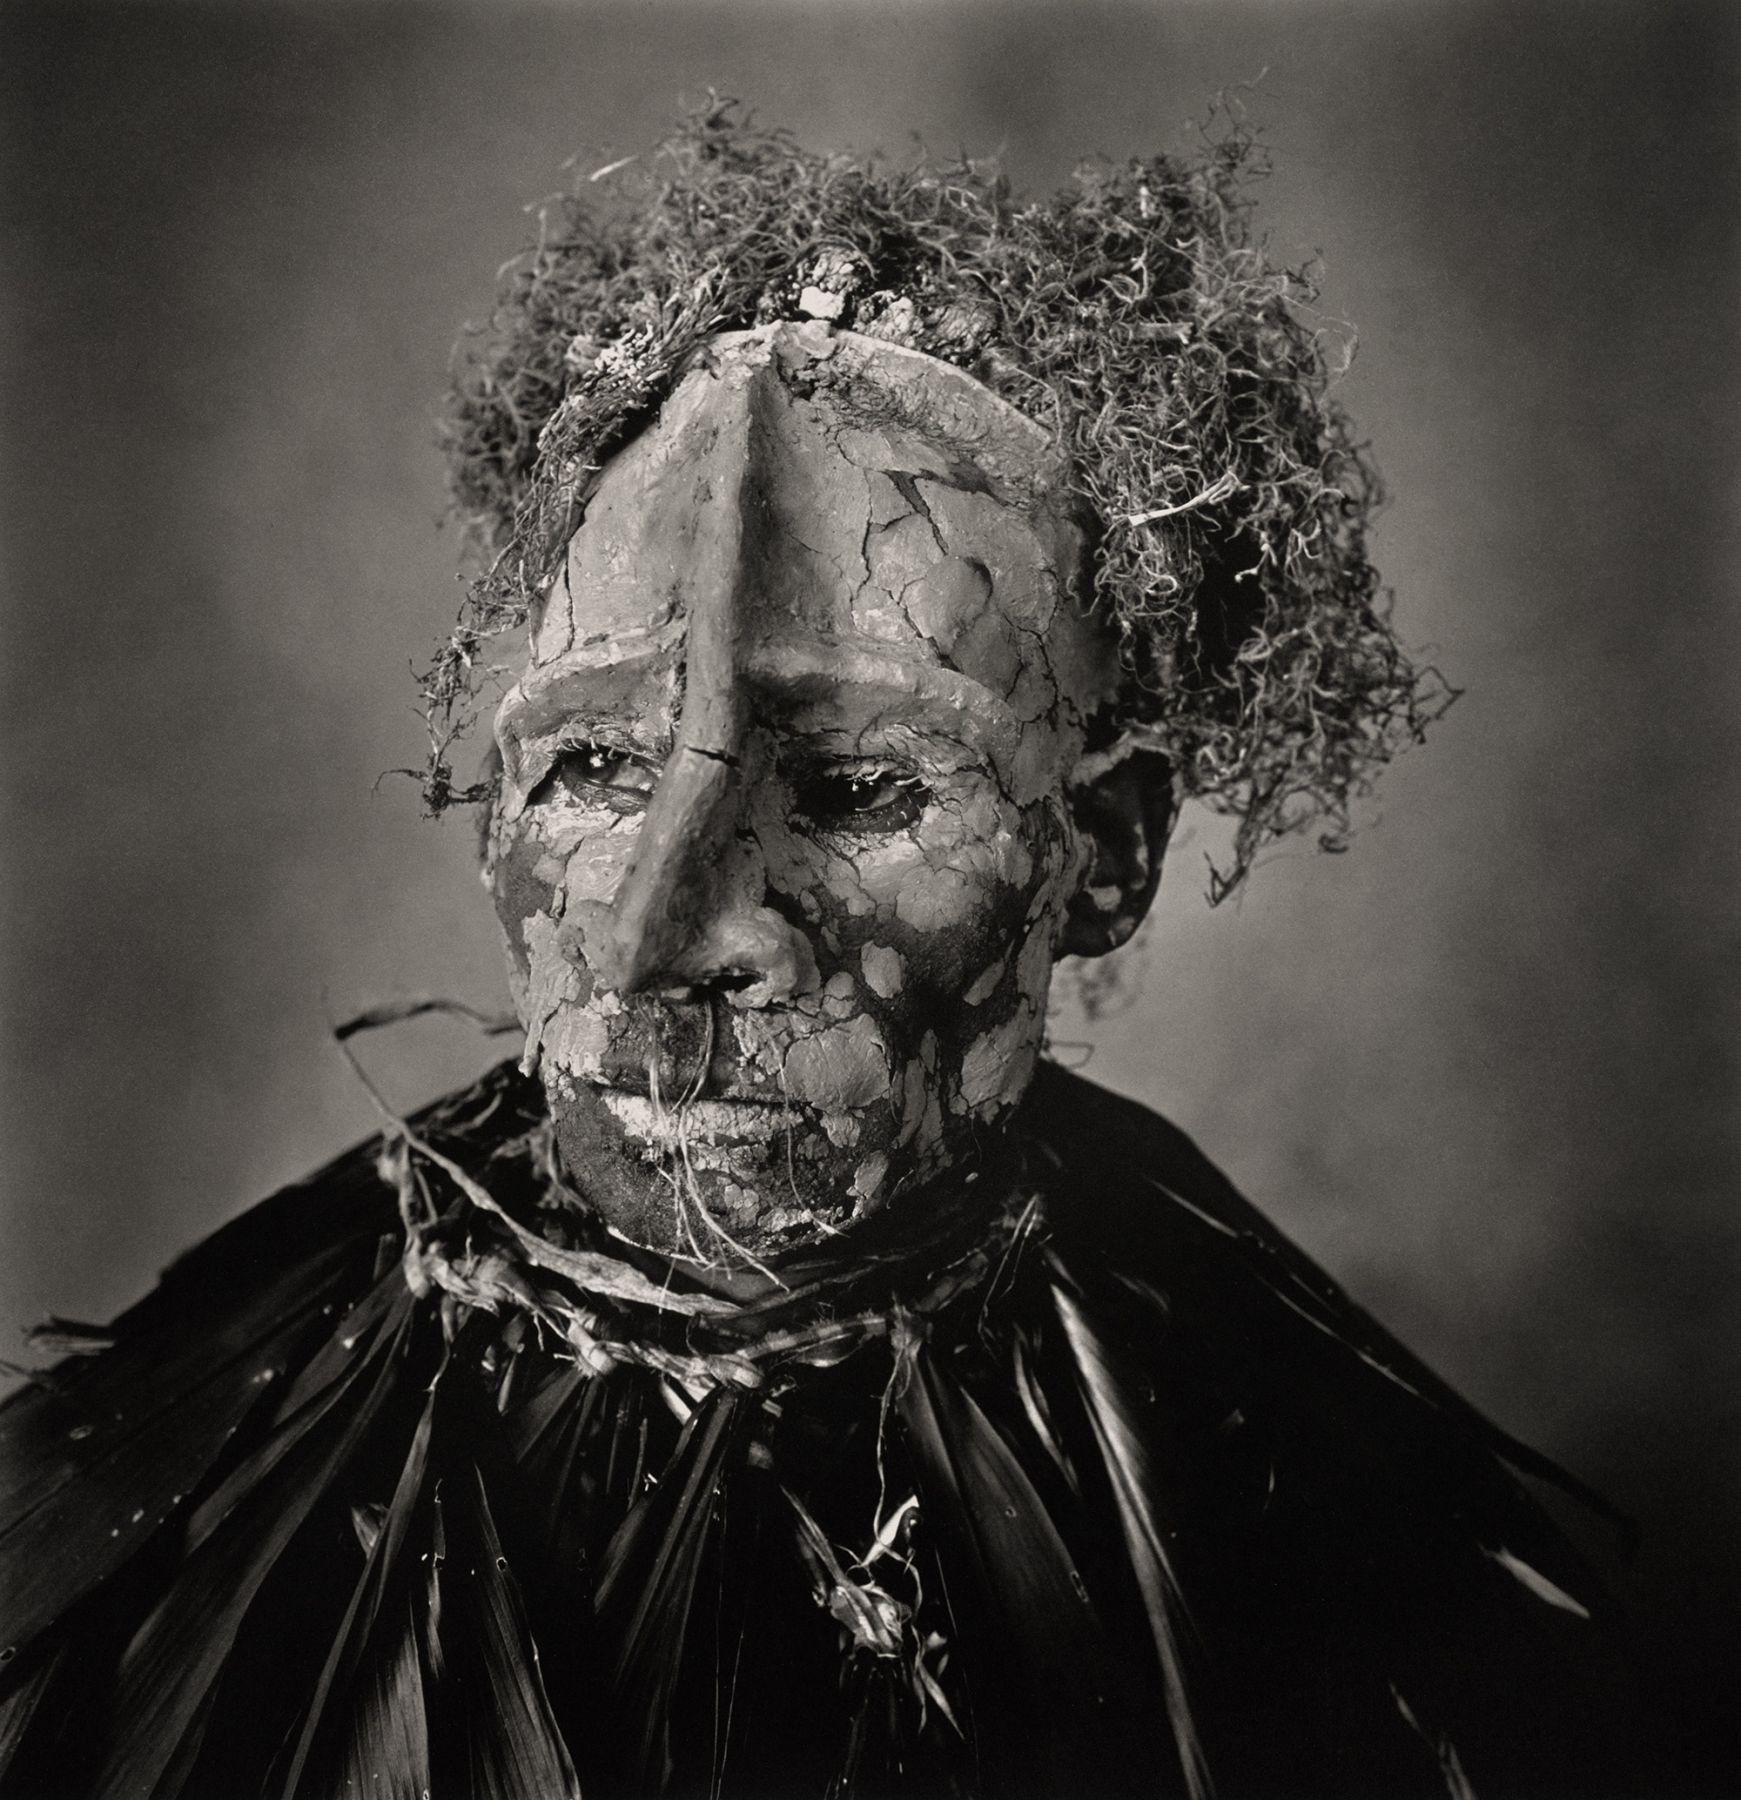 Man with Pink Face, New Guinea, 1970, Platinum Palladium Print Mounted to Aluminum, Ed. of 49